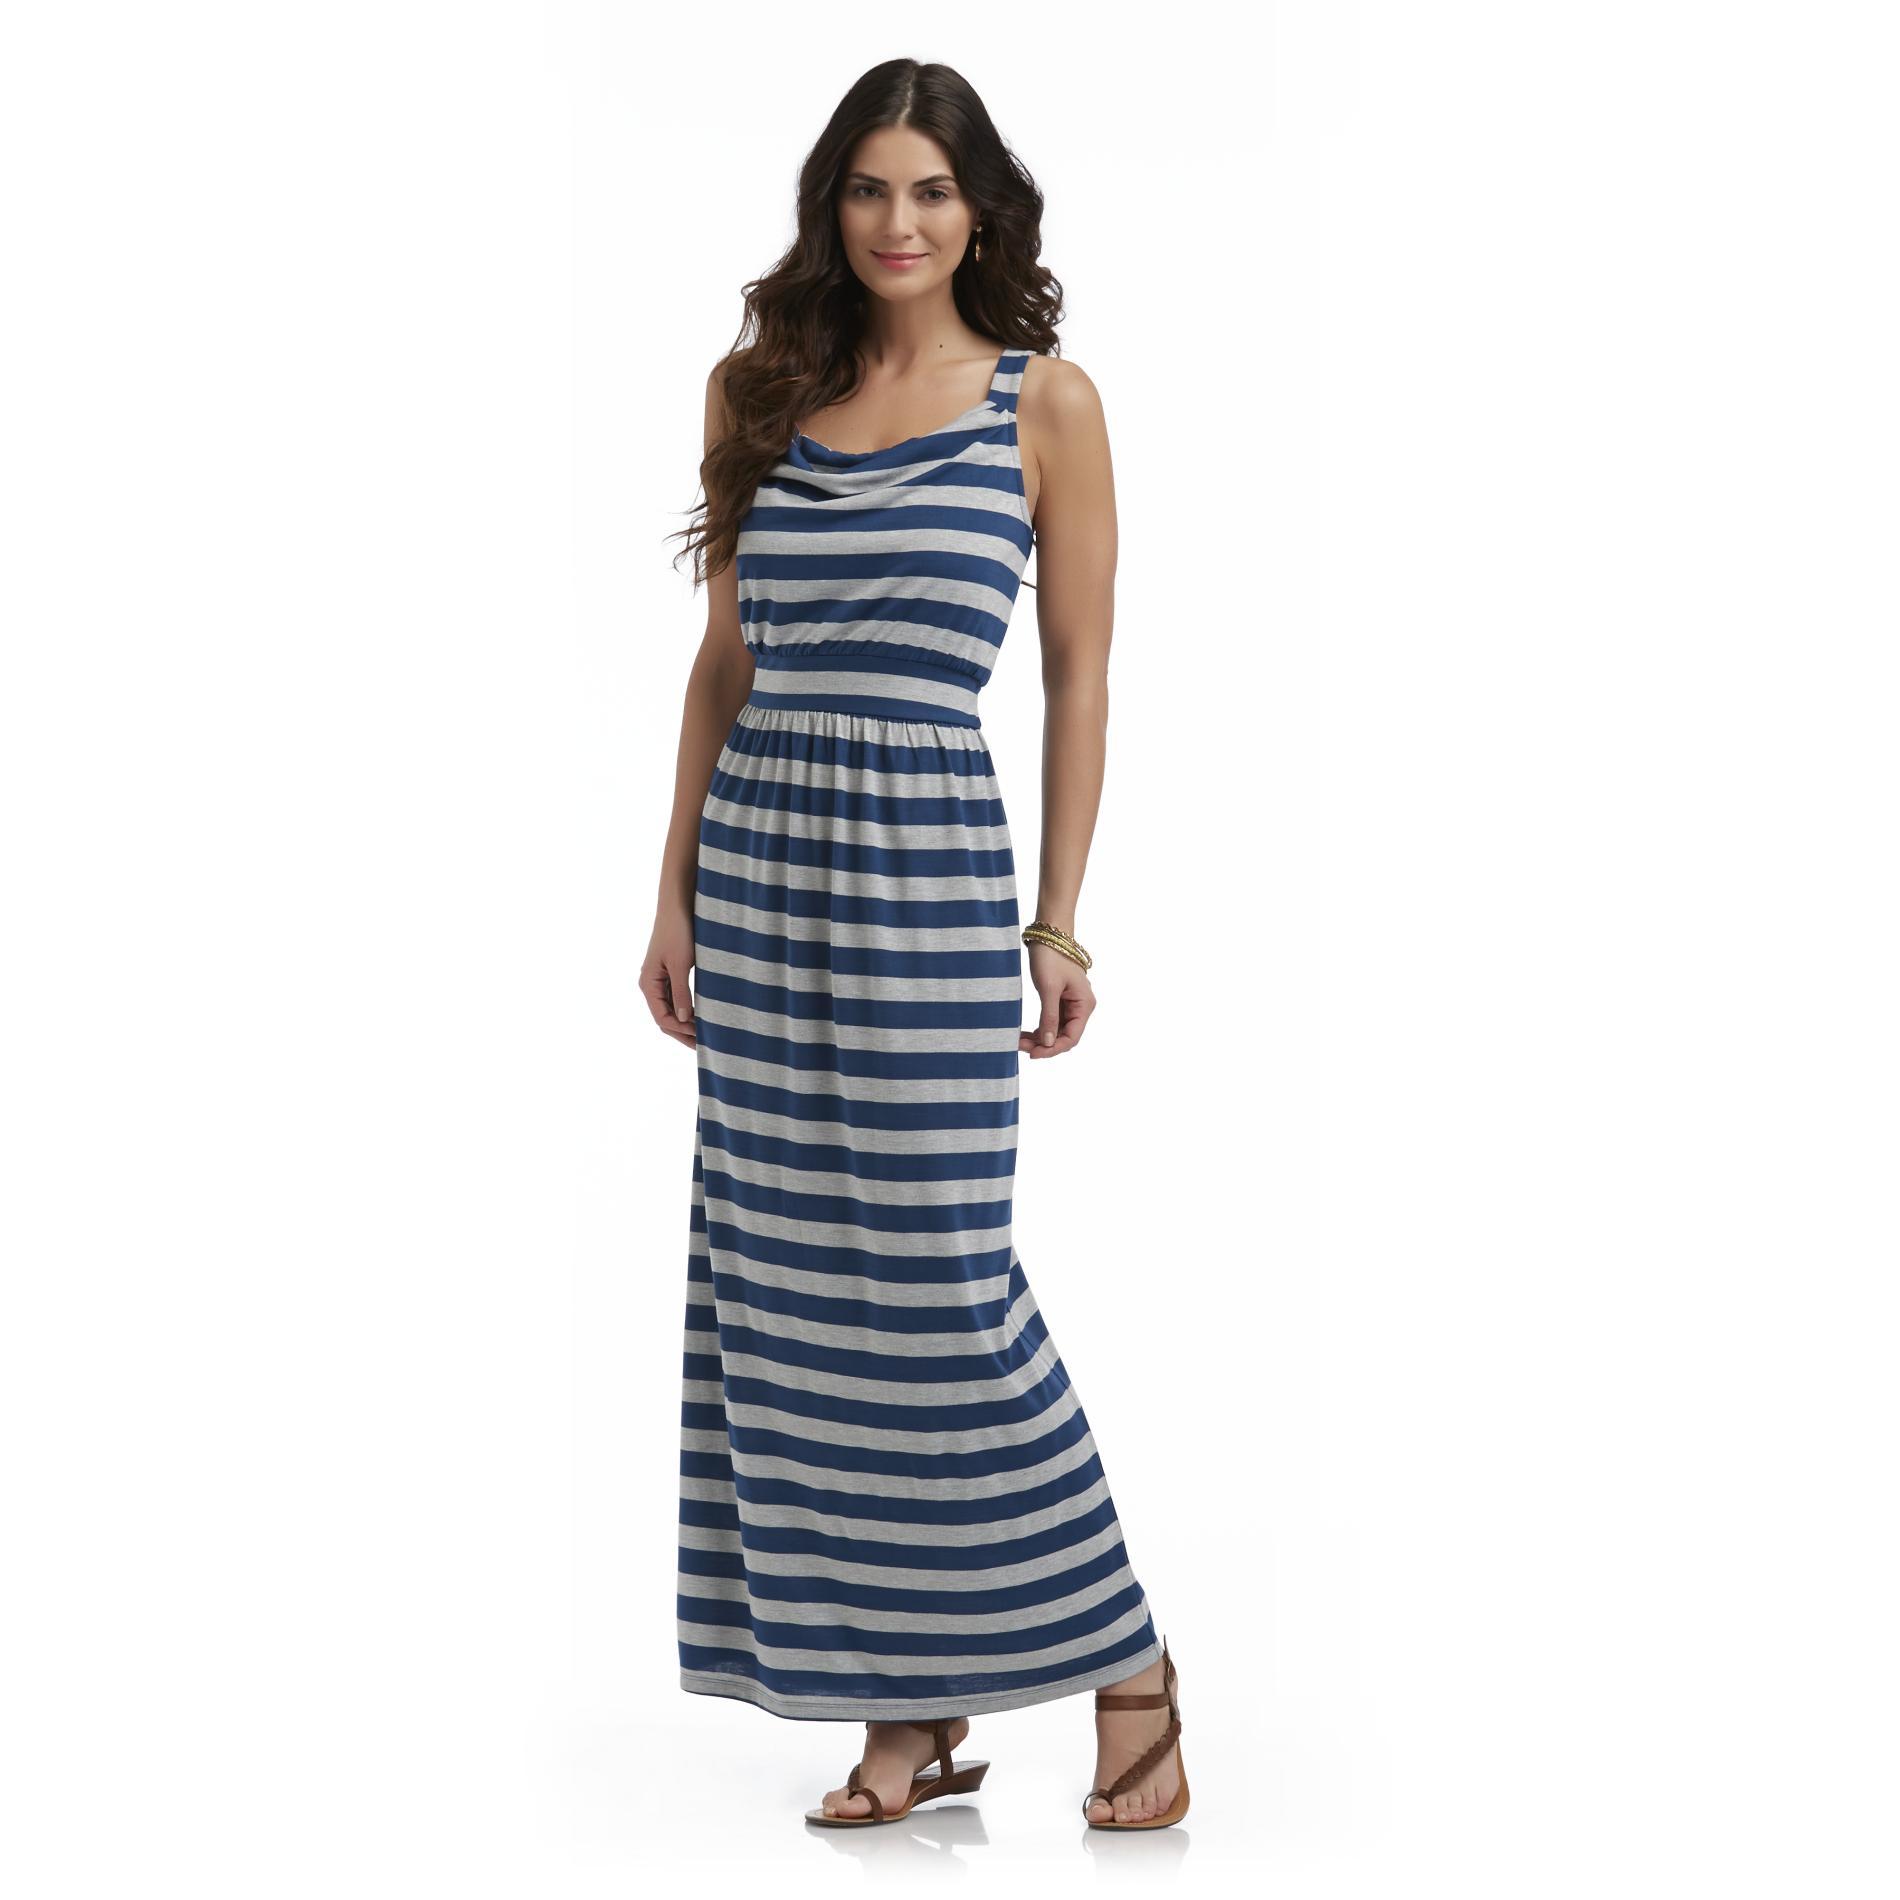 Metaphor Women's Maxi Dress - Striped at Sears.com